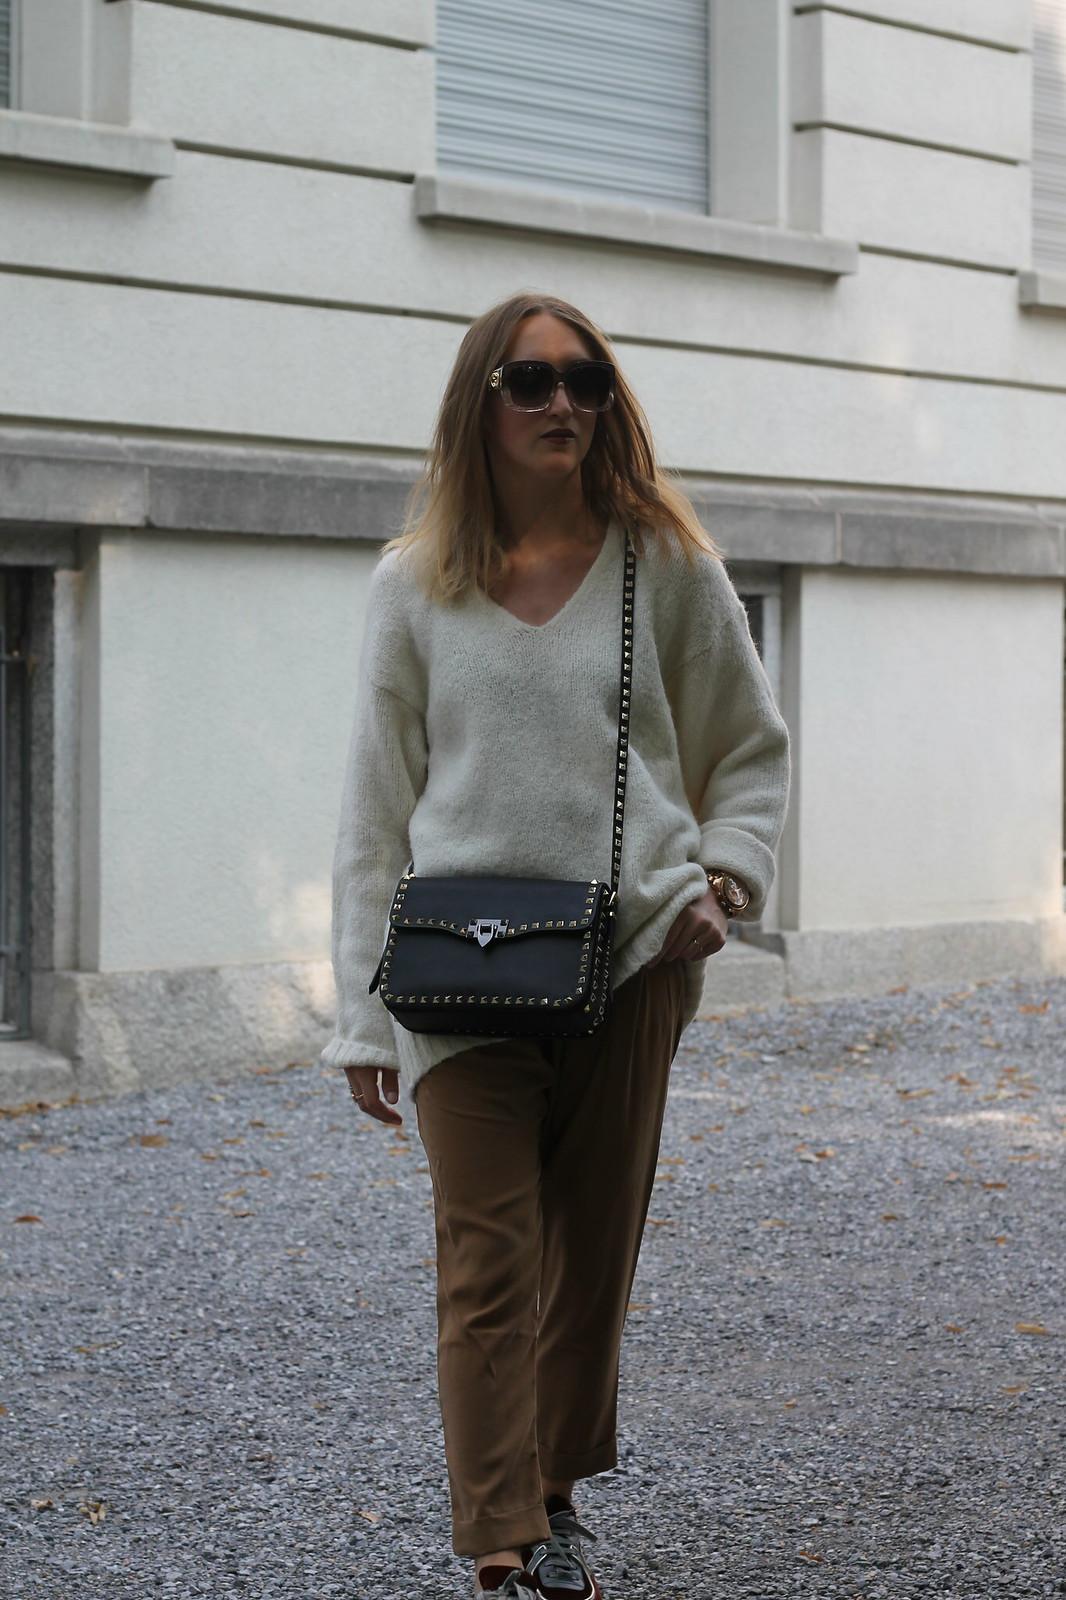 chanel-sneaker-whole-outfit-walk-wiebkembg